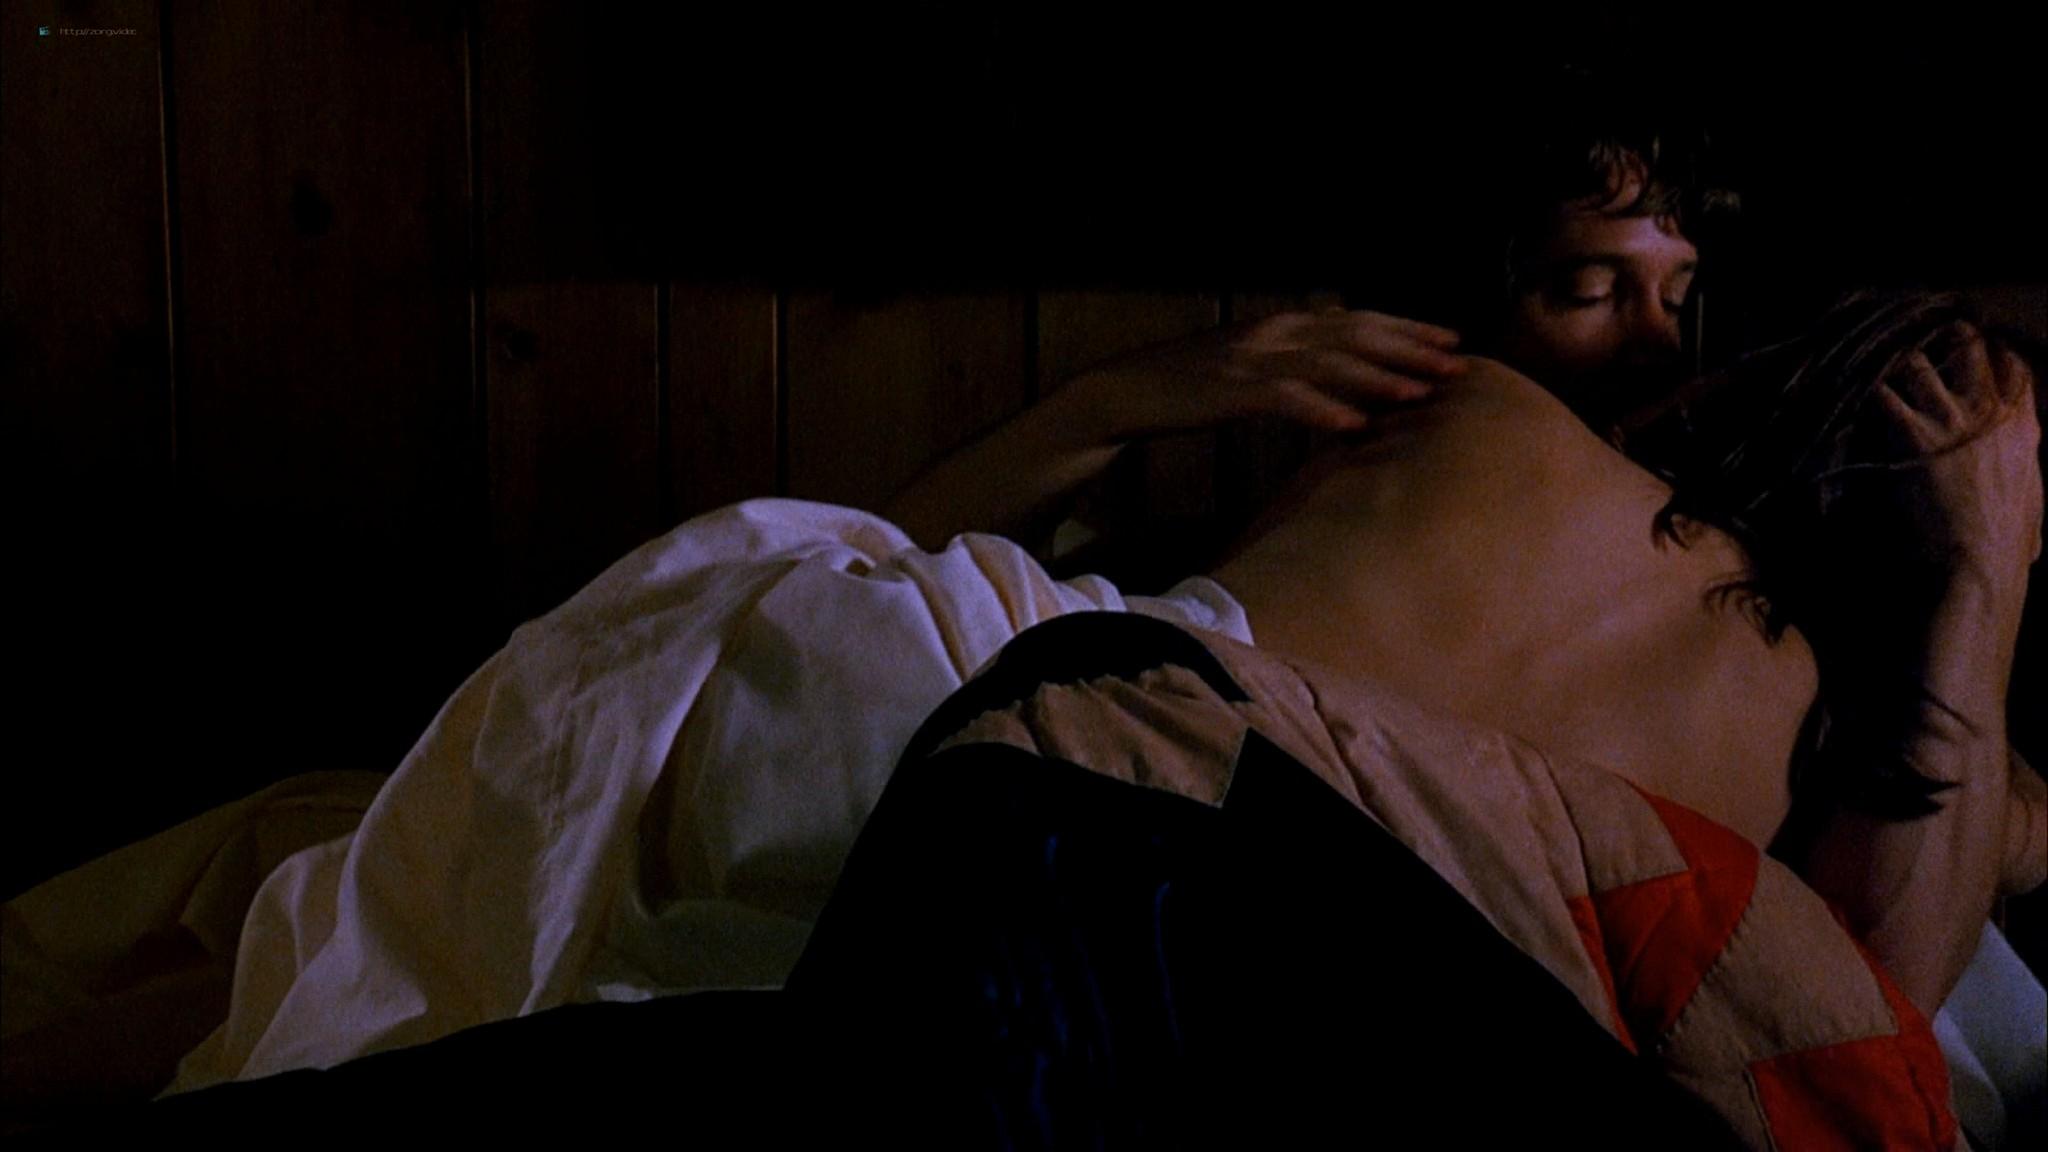 Marlee Matlin nude topless at the tub - Hear No Evil (1993) HD 1080p Web (2)